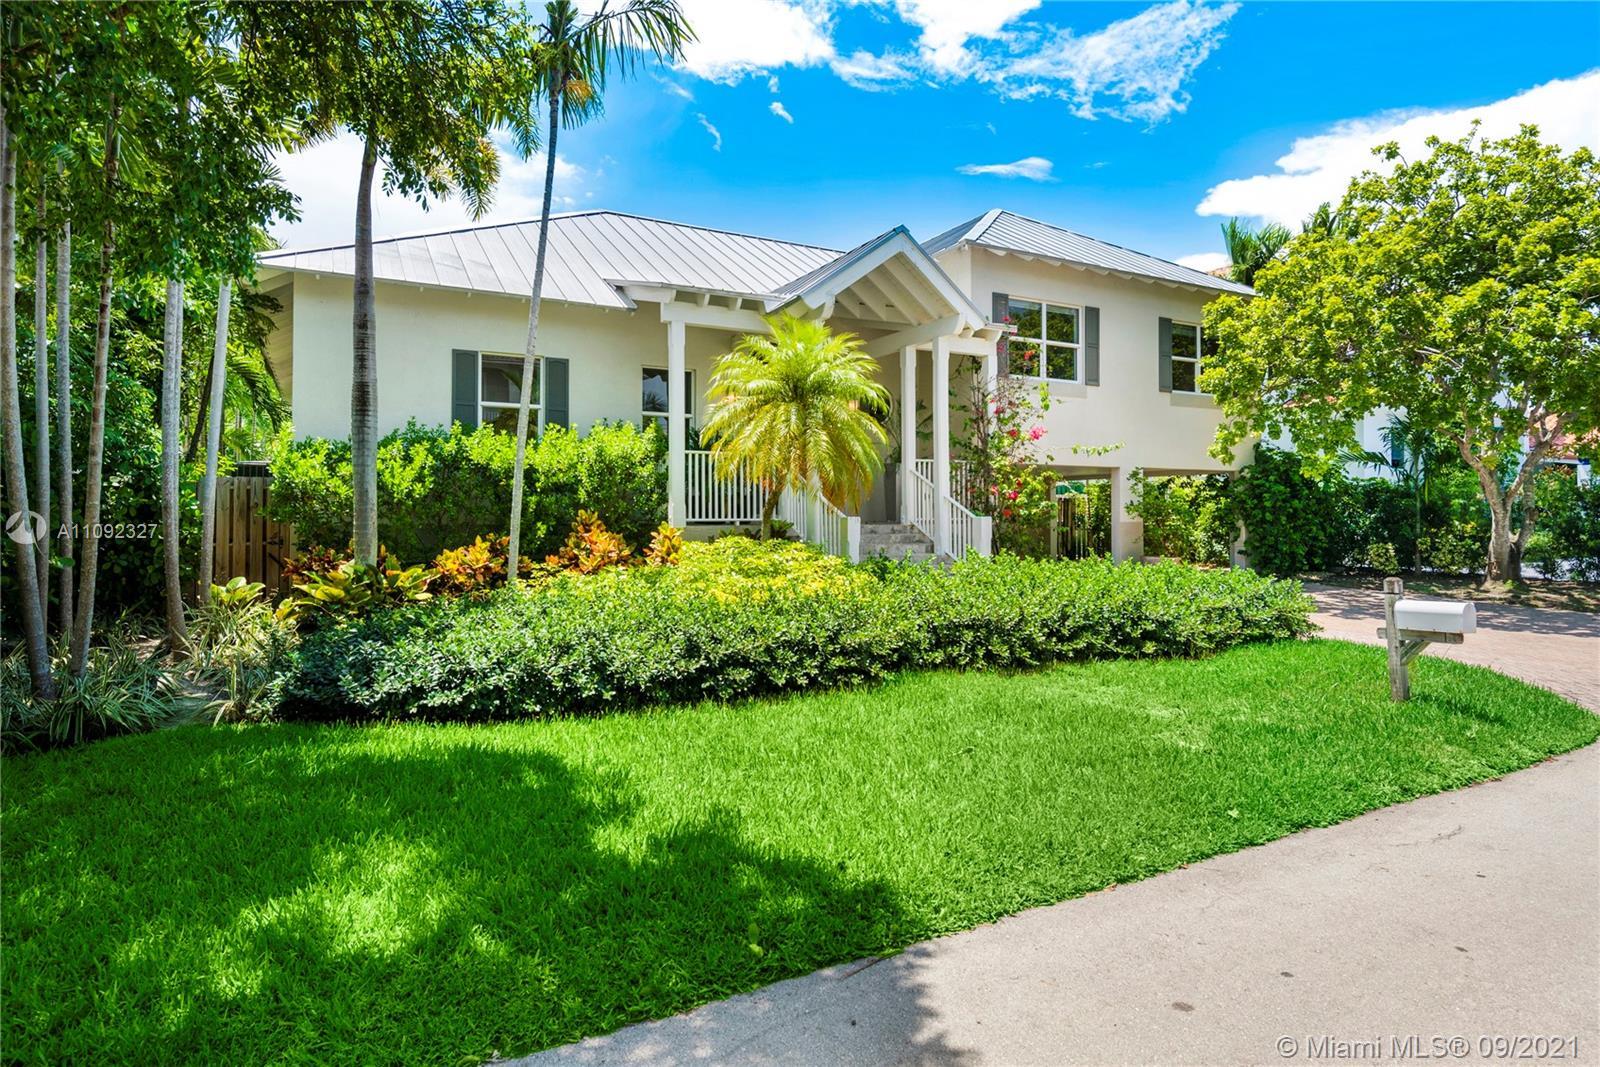 280 Ridgewood Rd, Key Biscayne, Florida 33149